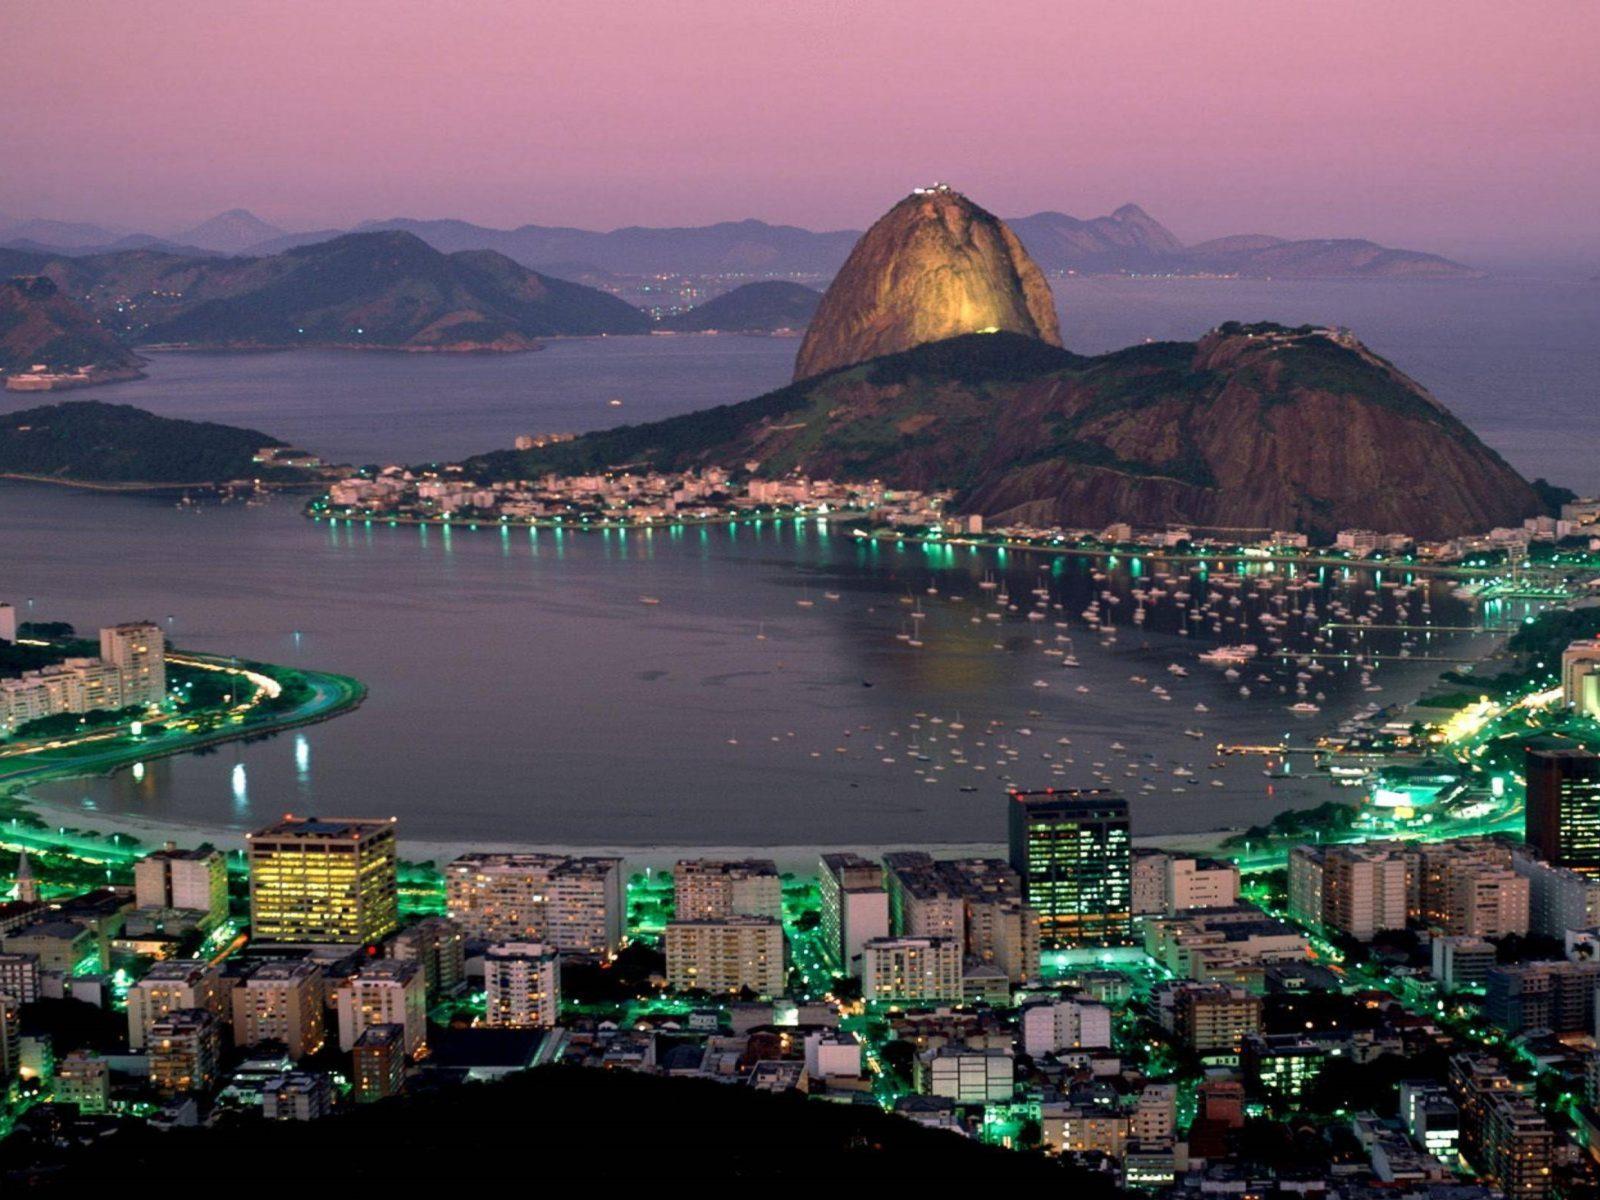 Wallpaper For Iphone 5 Home Screen Rio De Janeiro At Night Wallpaper Hd 235364 Wallpapers13 Com